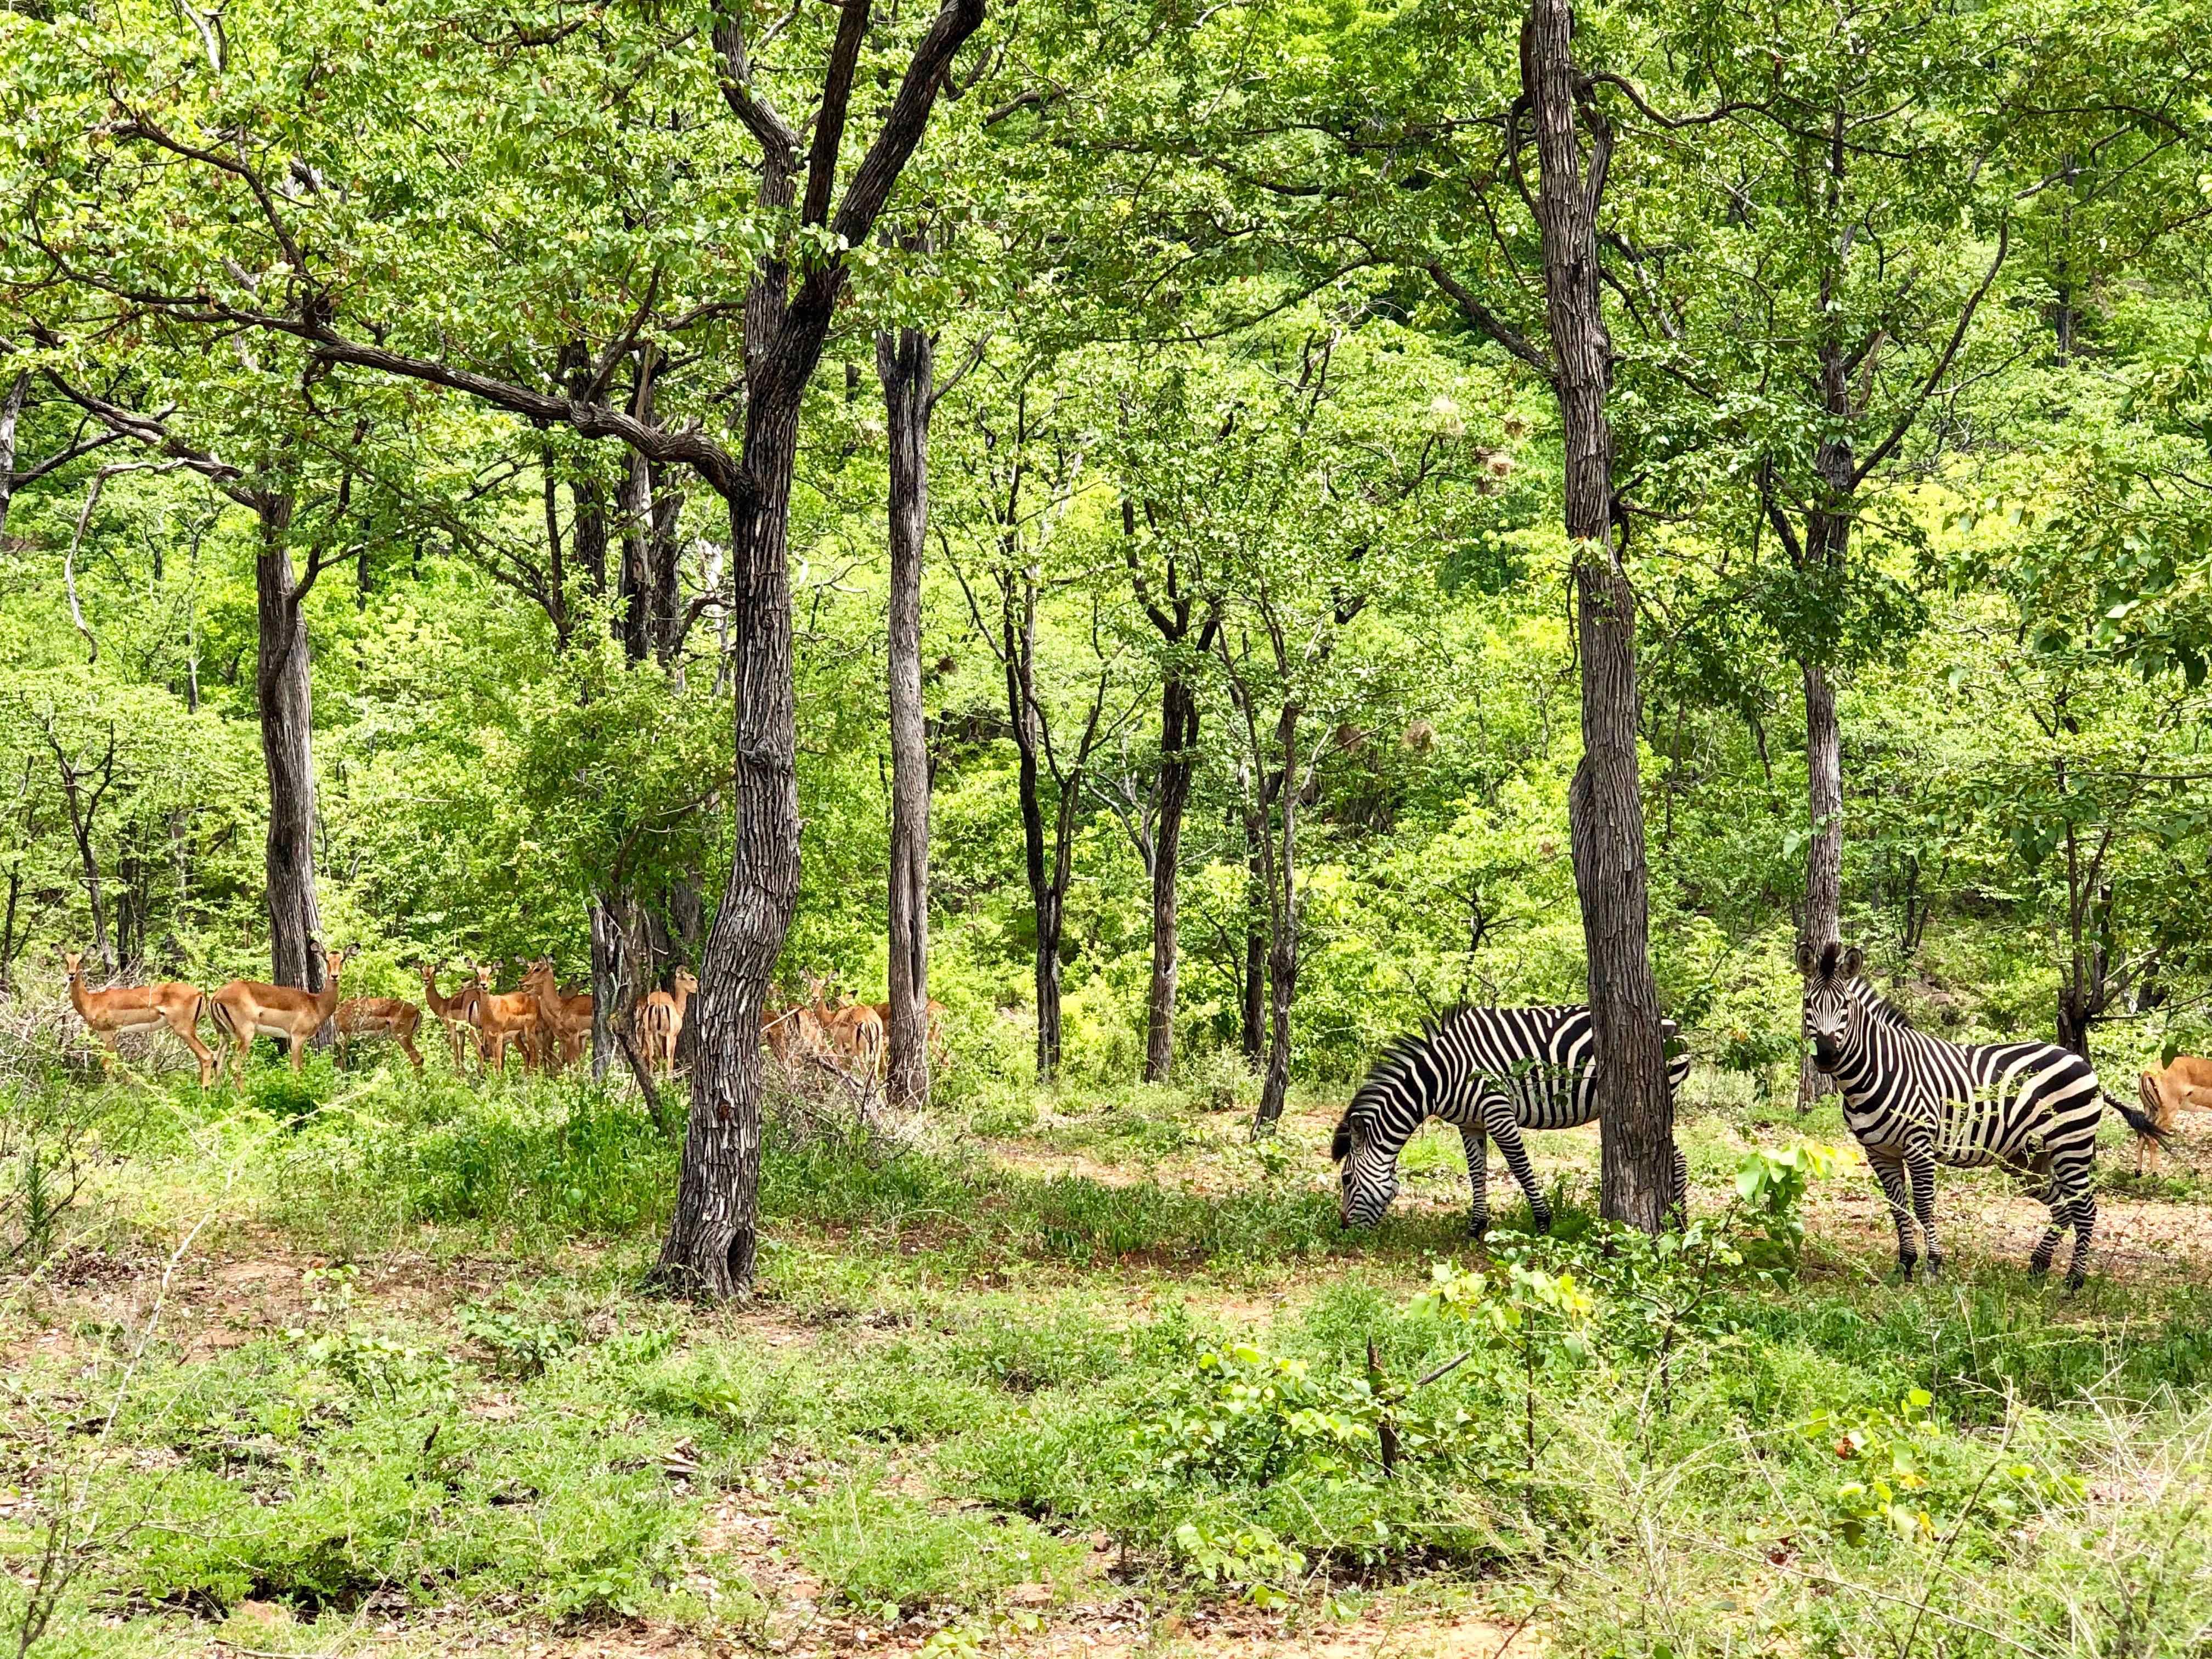 Lotri Bay, Lake Kariba, Zambia - Zebras and Impala